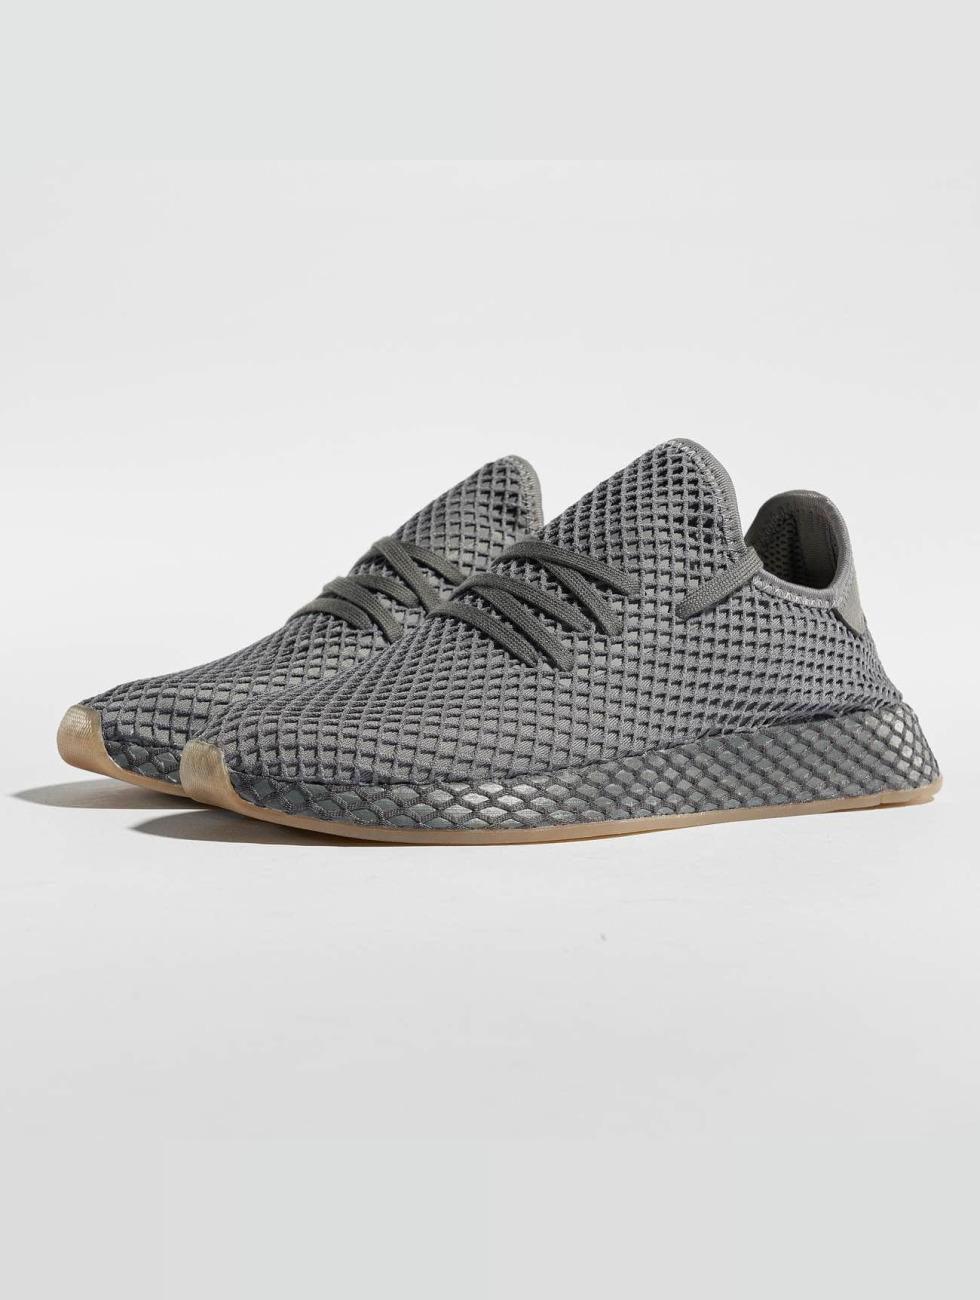 Adidas Originals Pattino / Sneaker Corridore Deerupt In Grigio 409 941 aTGnV9WVp